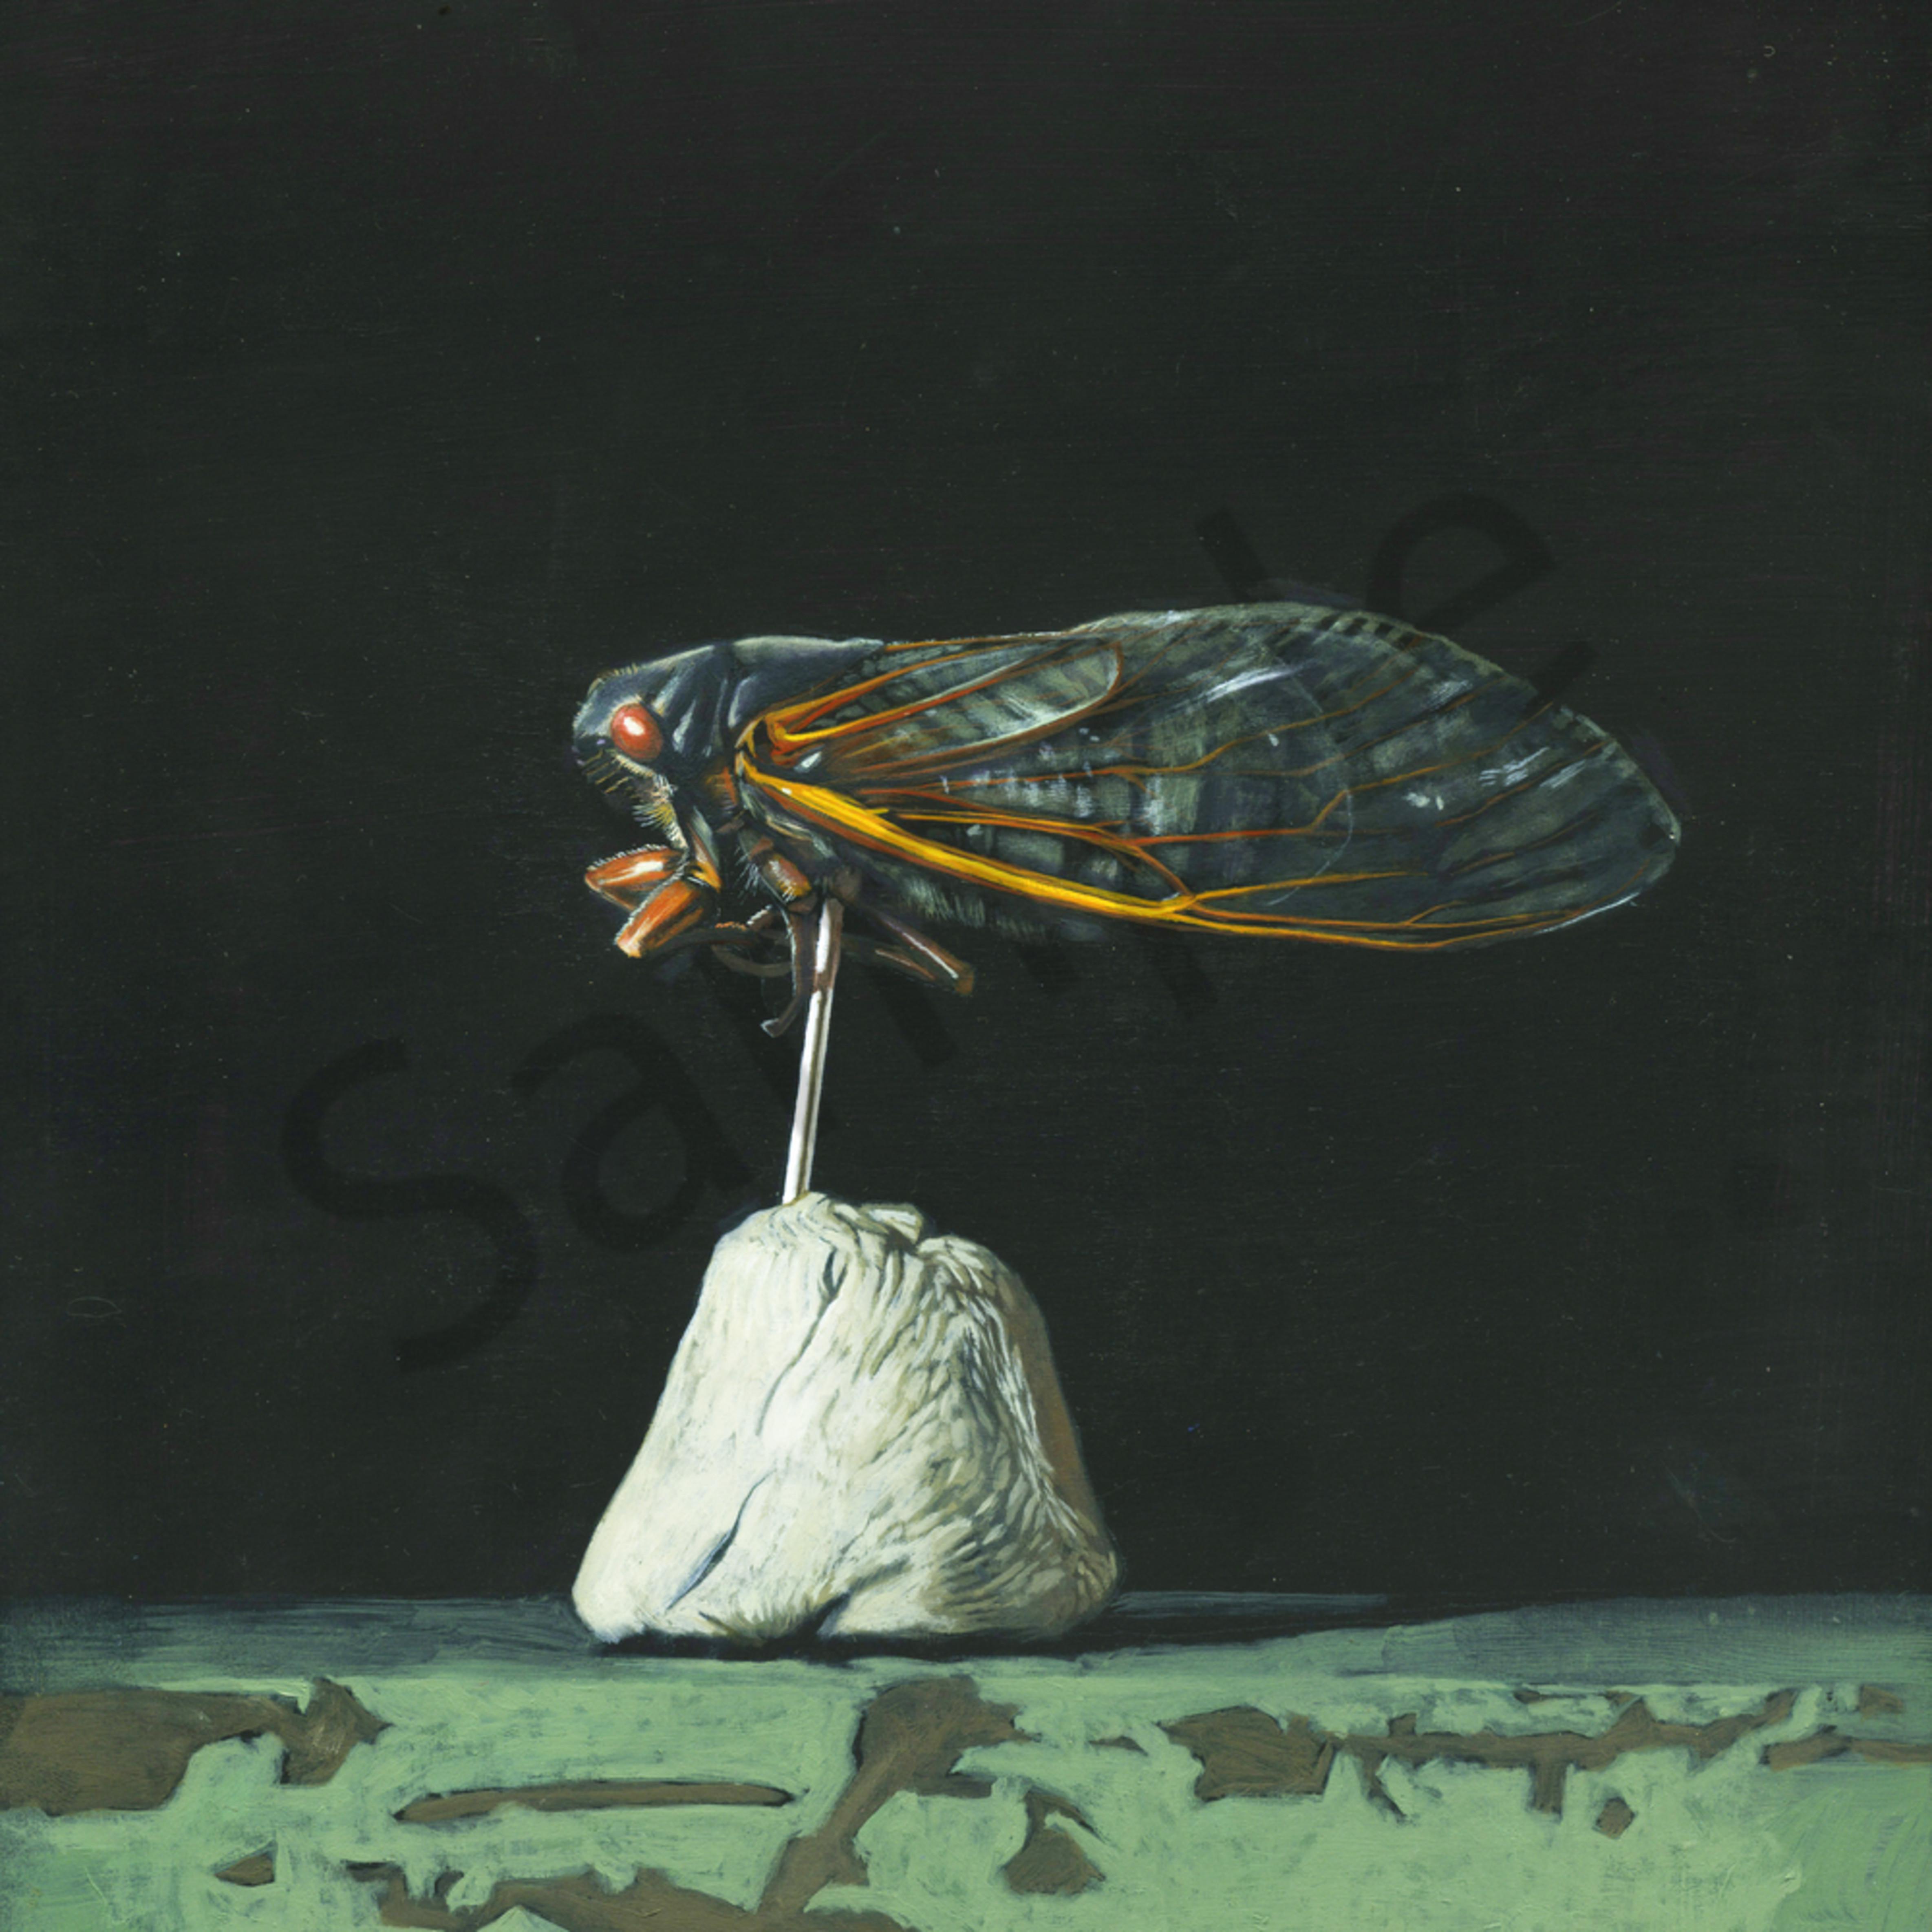 Cicada dark nqszbw